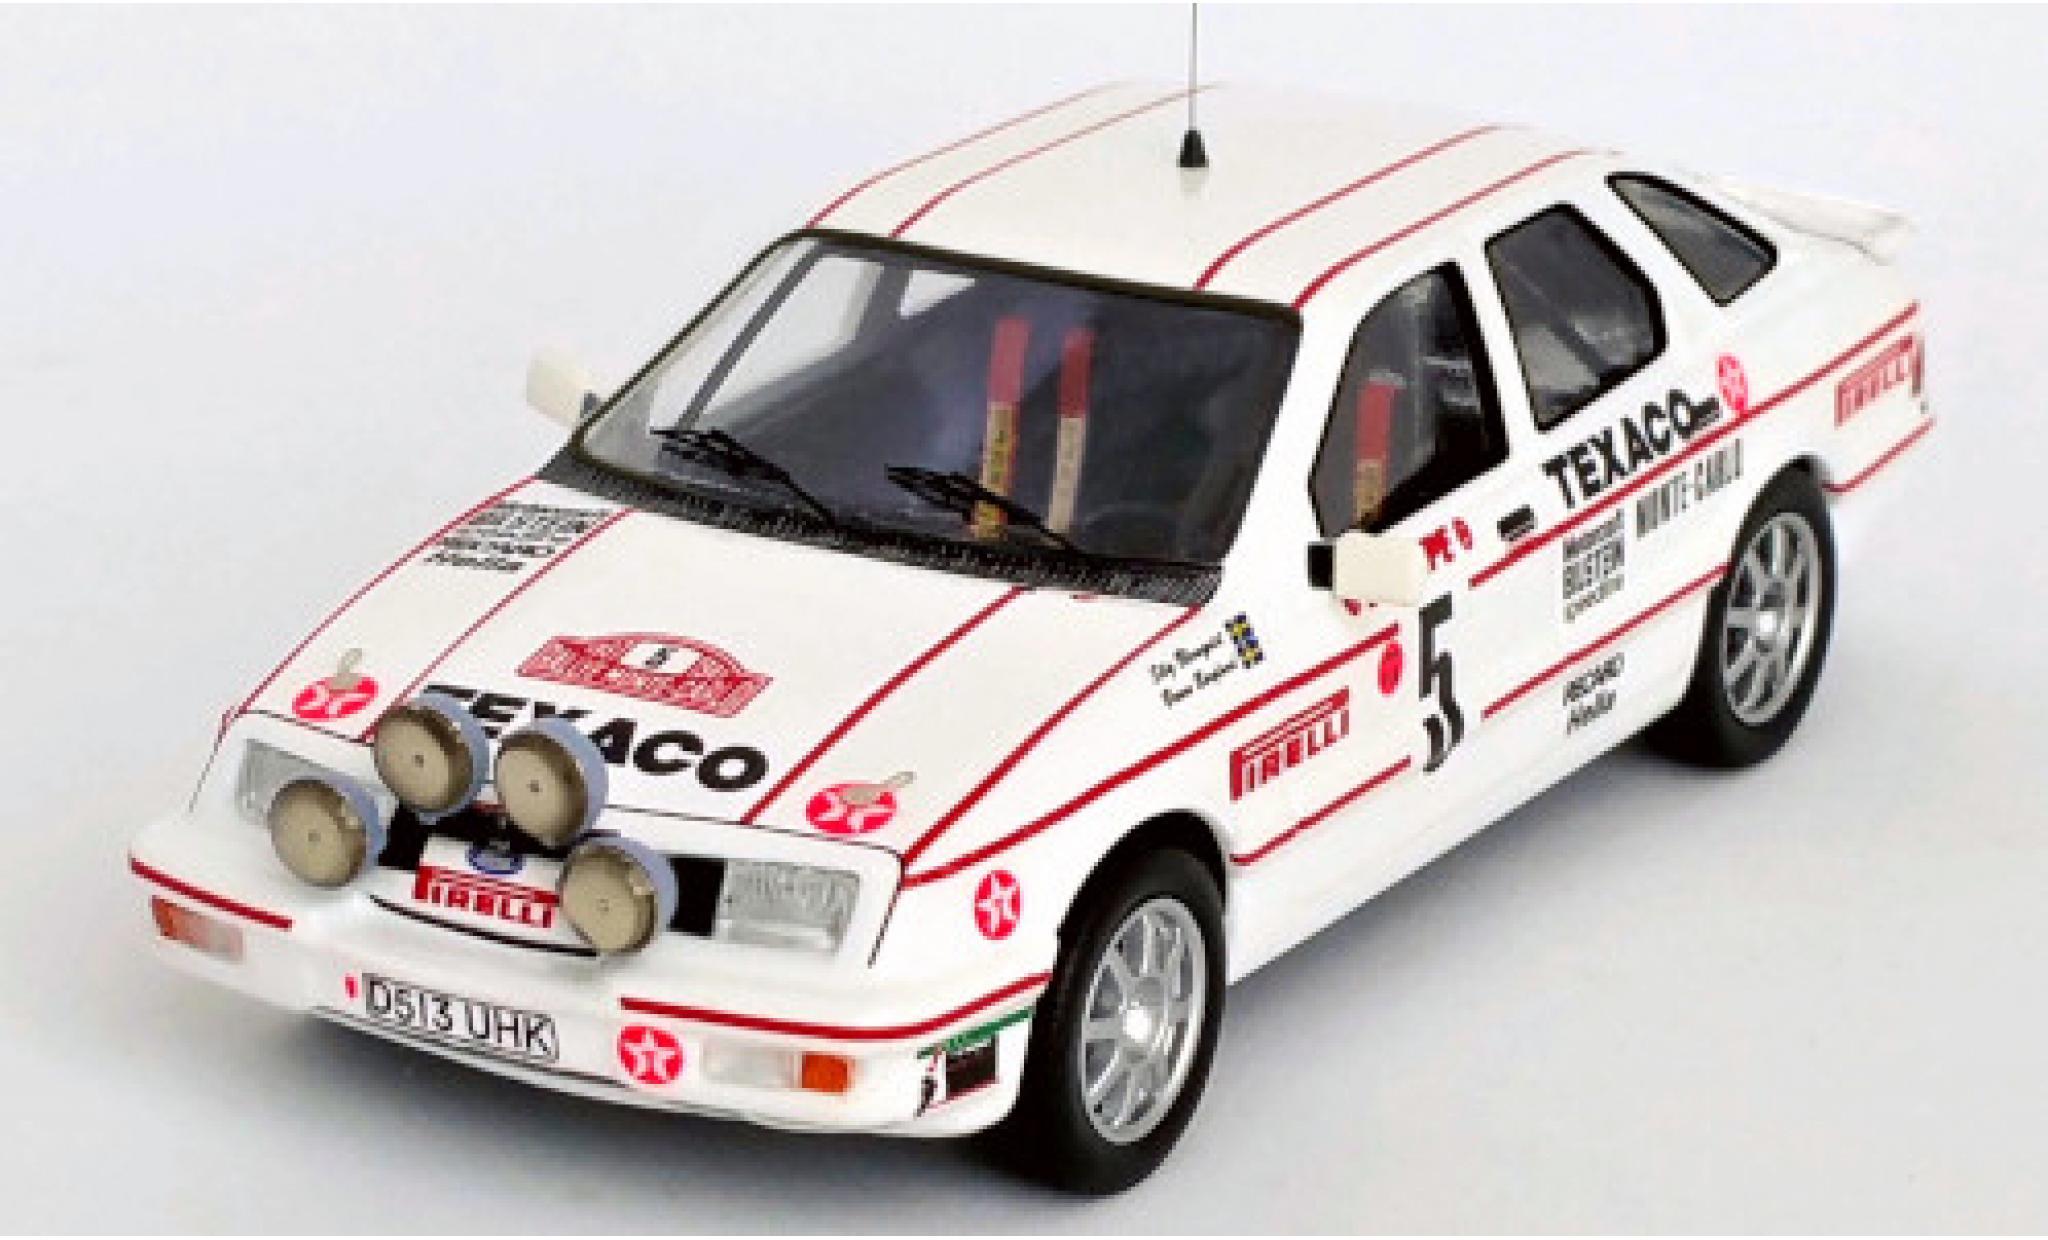 Ford Sierra 1/43 Trofeu XR 4x4 No.5 Texaco Rallye WM Rallye Monte Carlo 1987 S.Blomqvist/B.Berglund